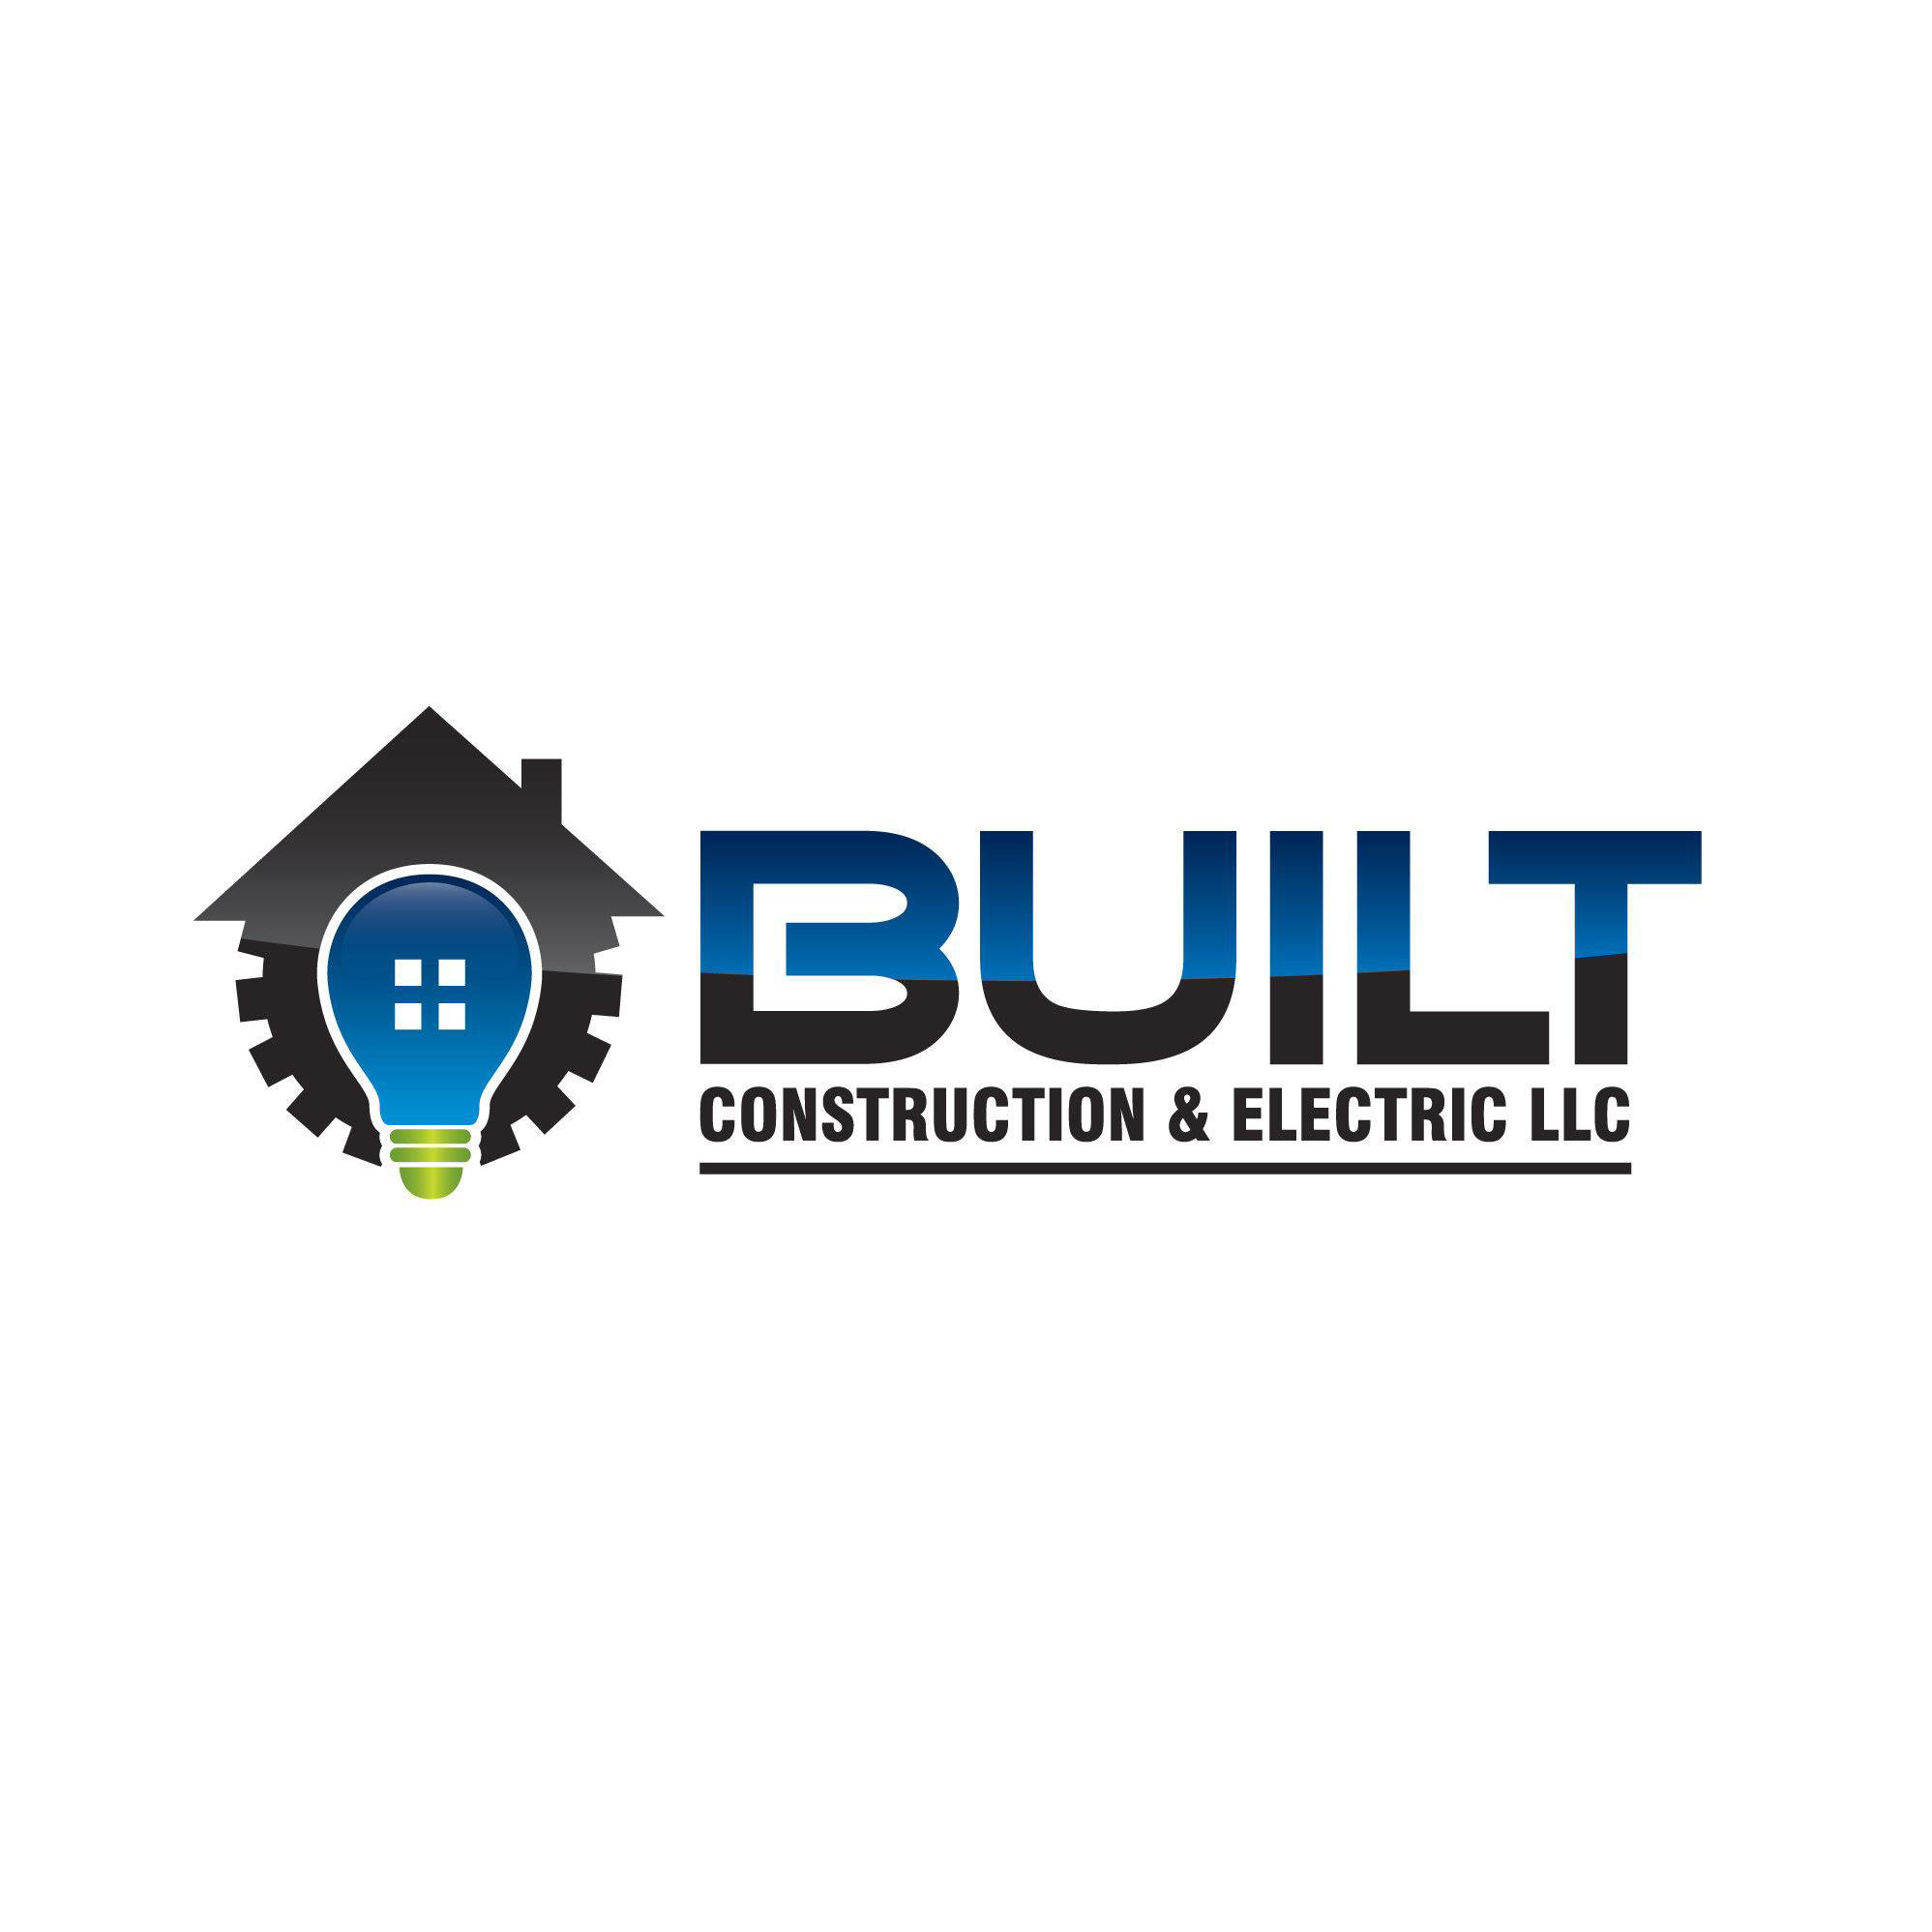 Built Construction & Electric LLC image 13